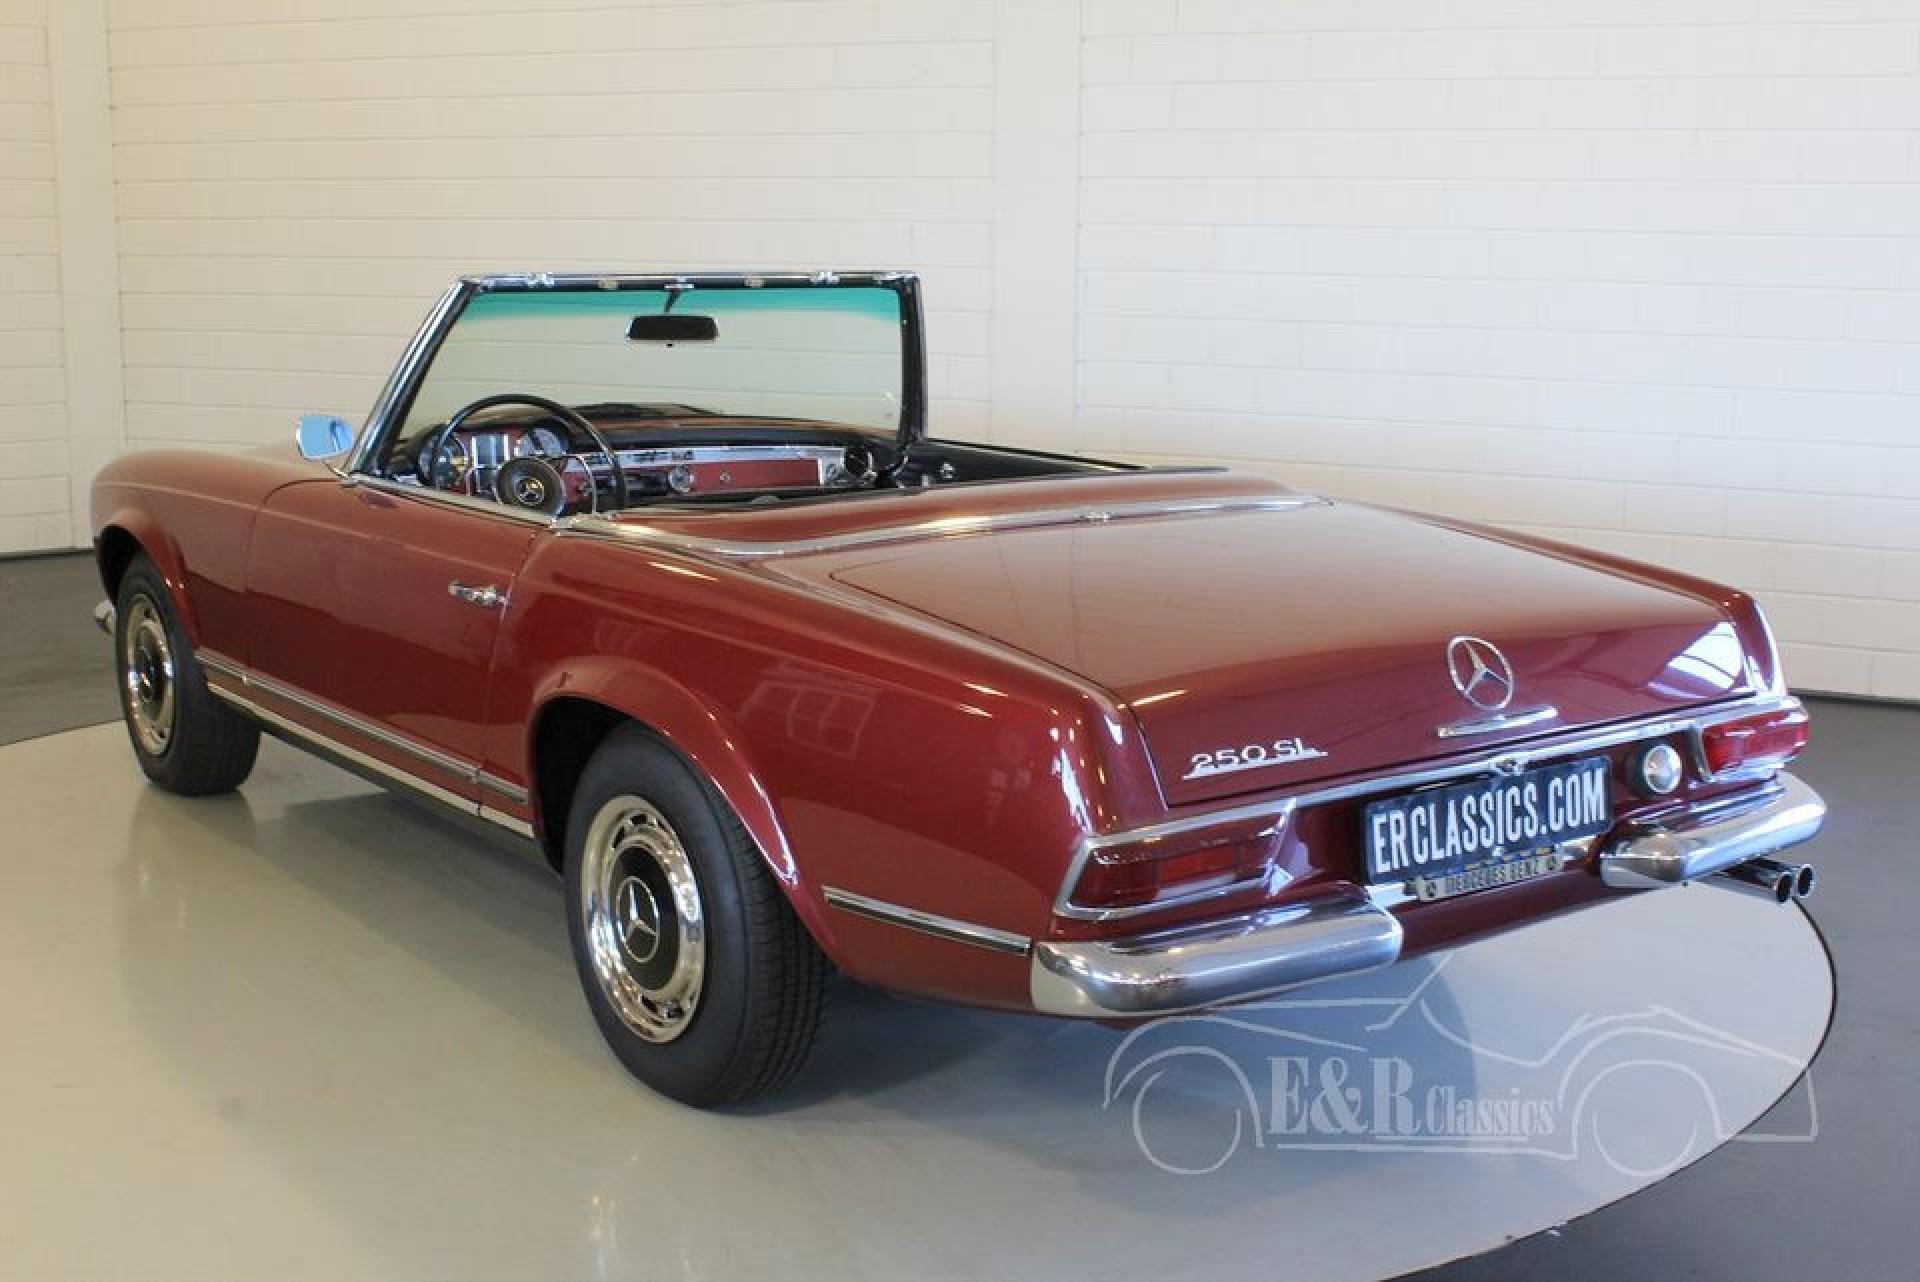 Mercedes benz 250 sl pagode 1967 for sale at erclassics for Mercedes benz classics for sale